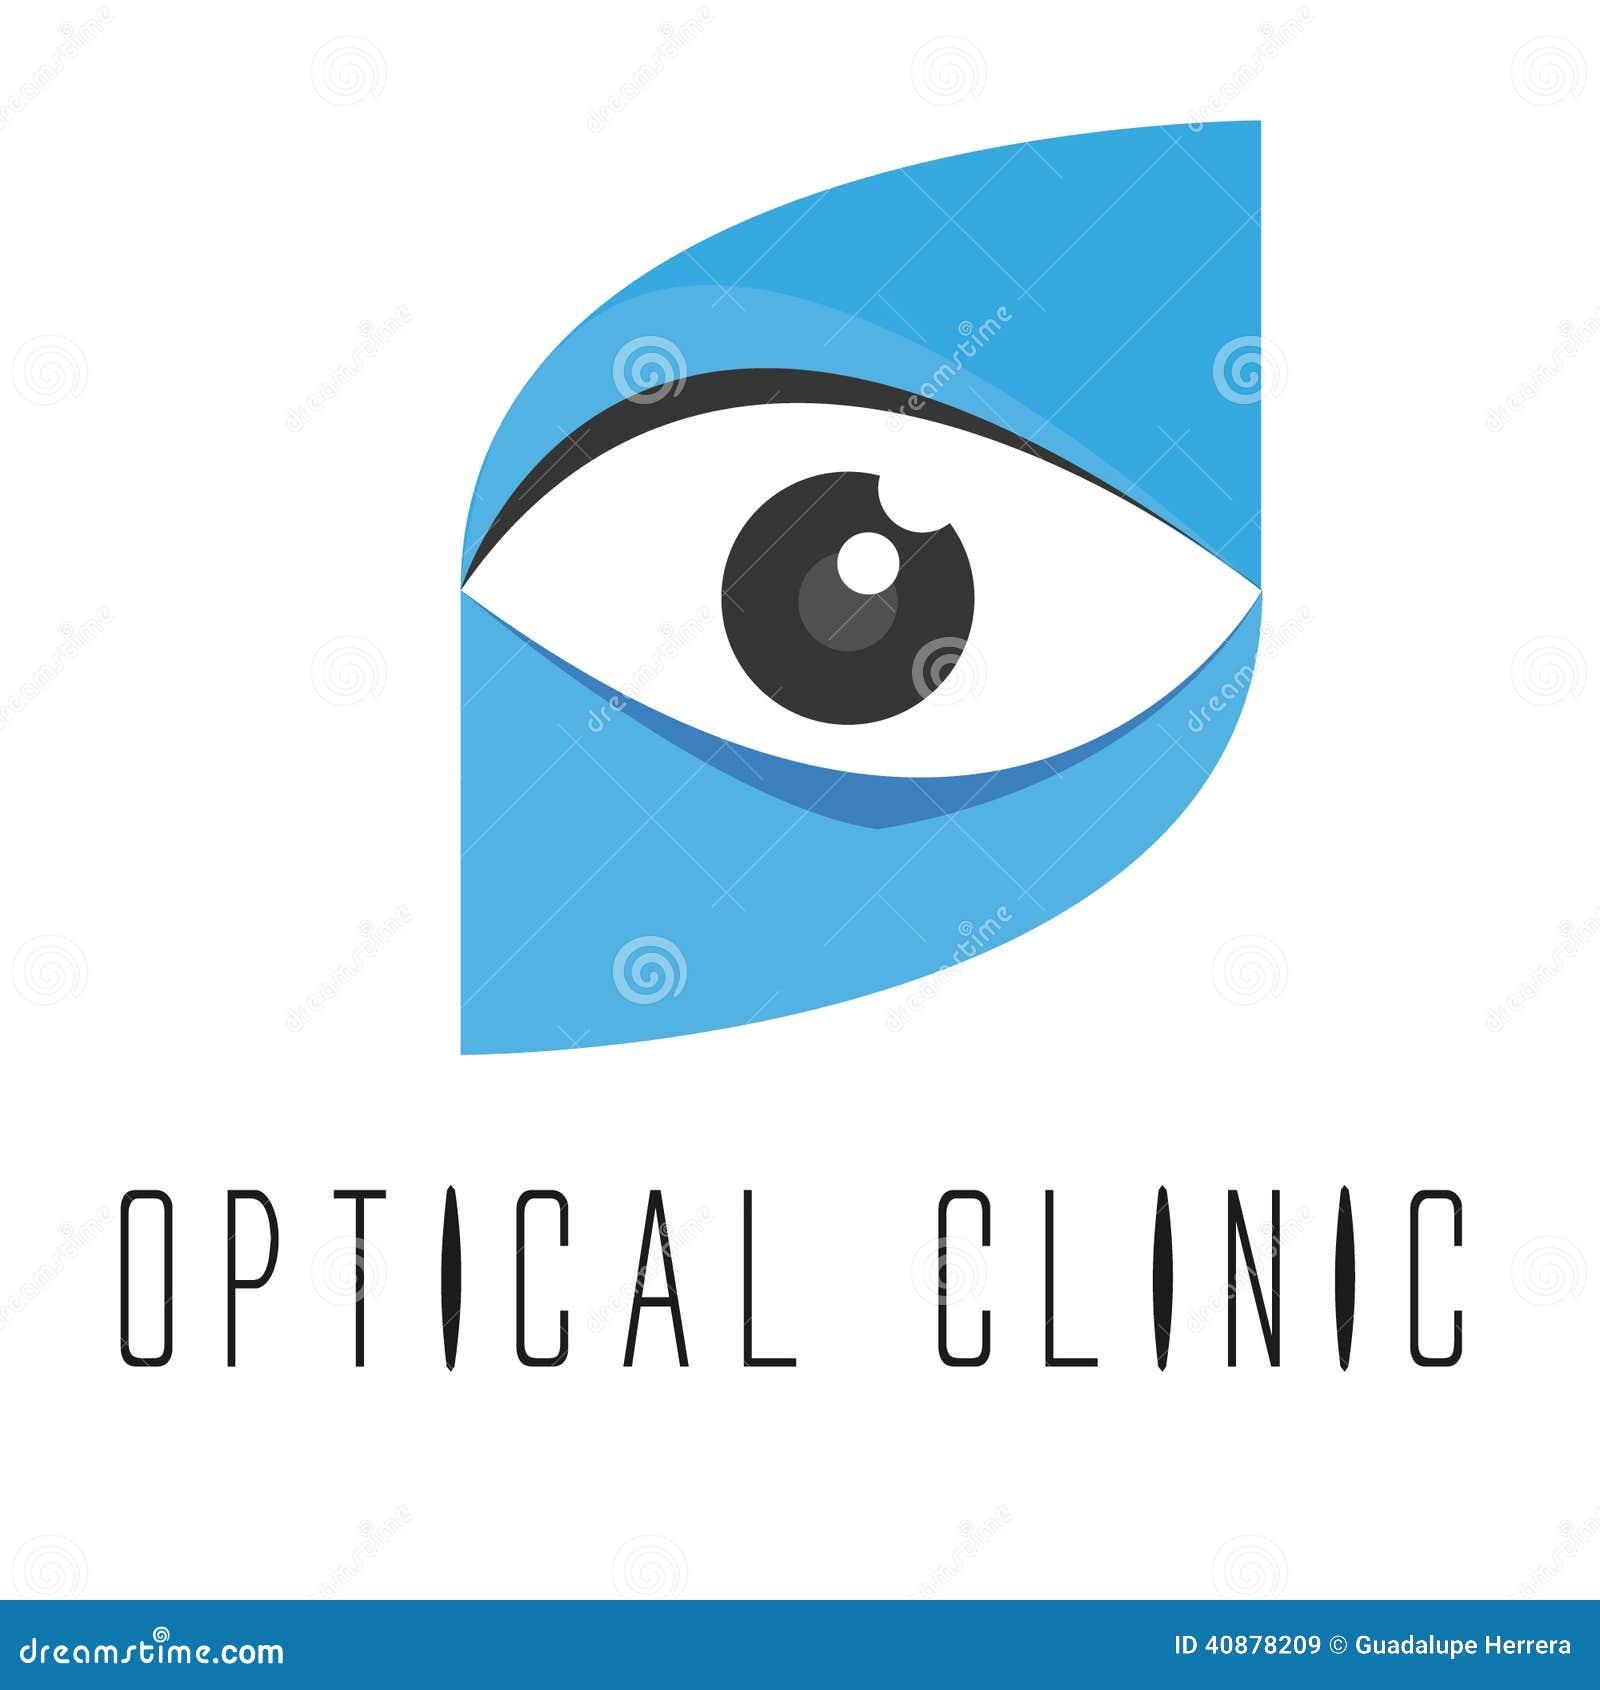 Optical logo design